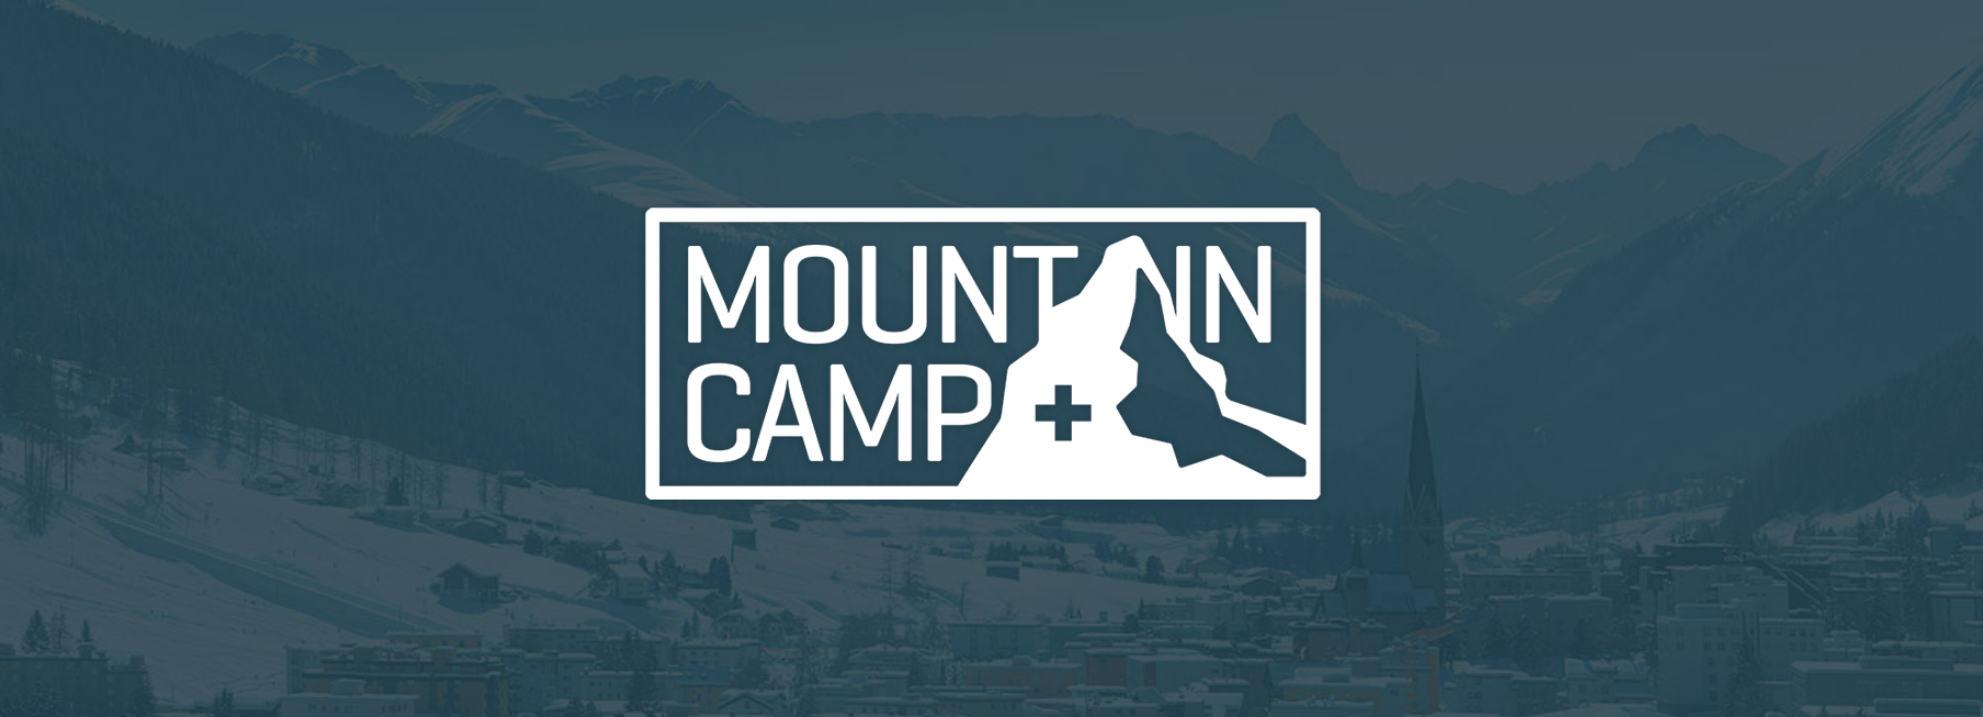 Drupal Mountain camp